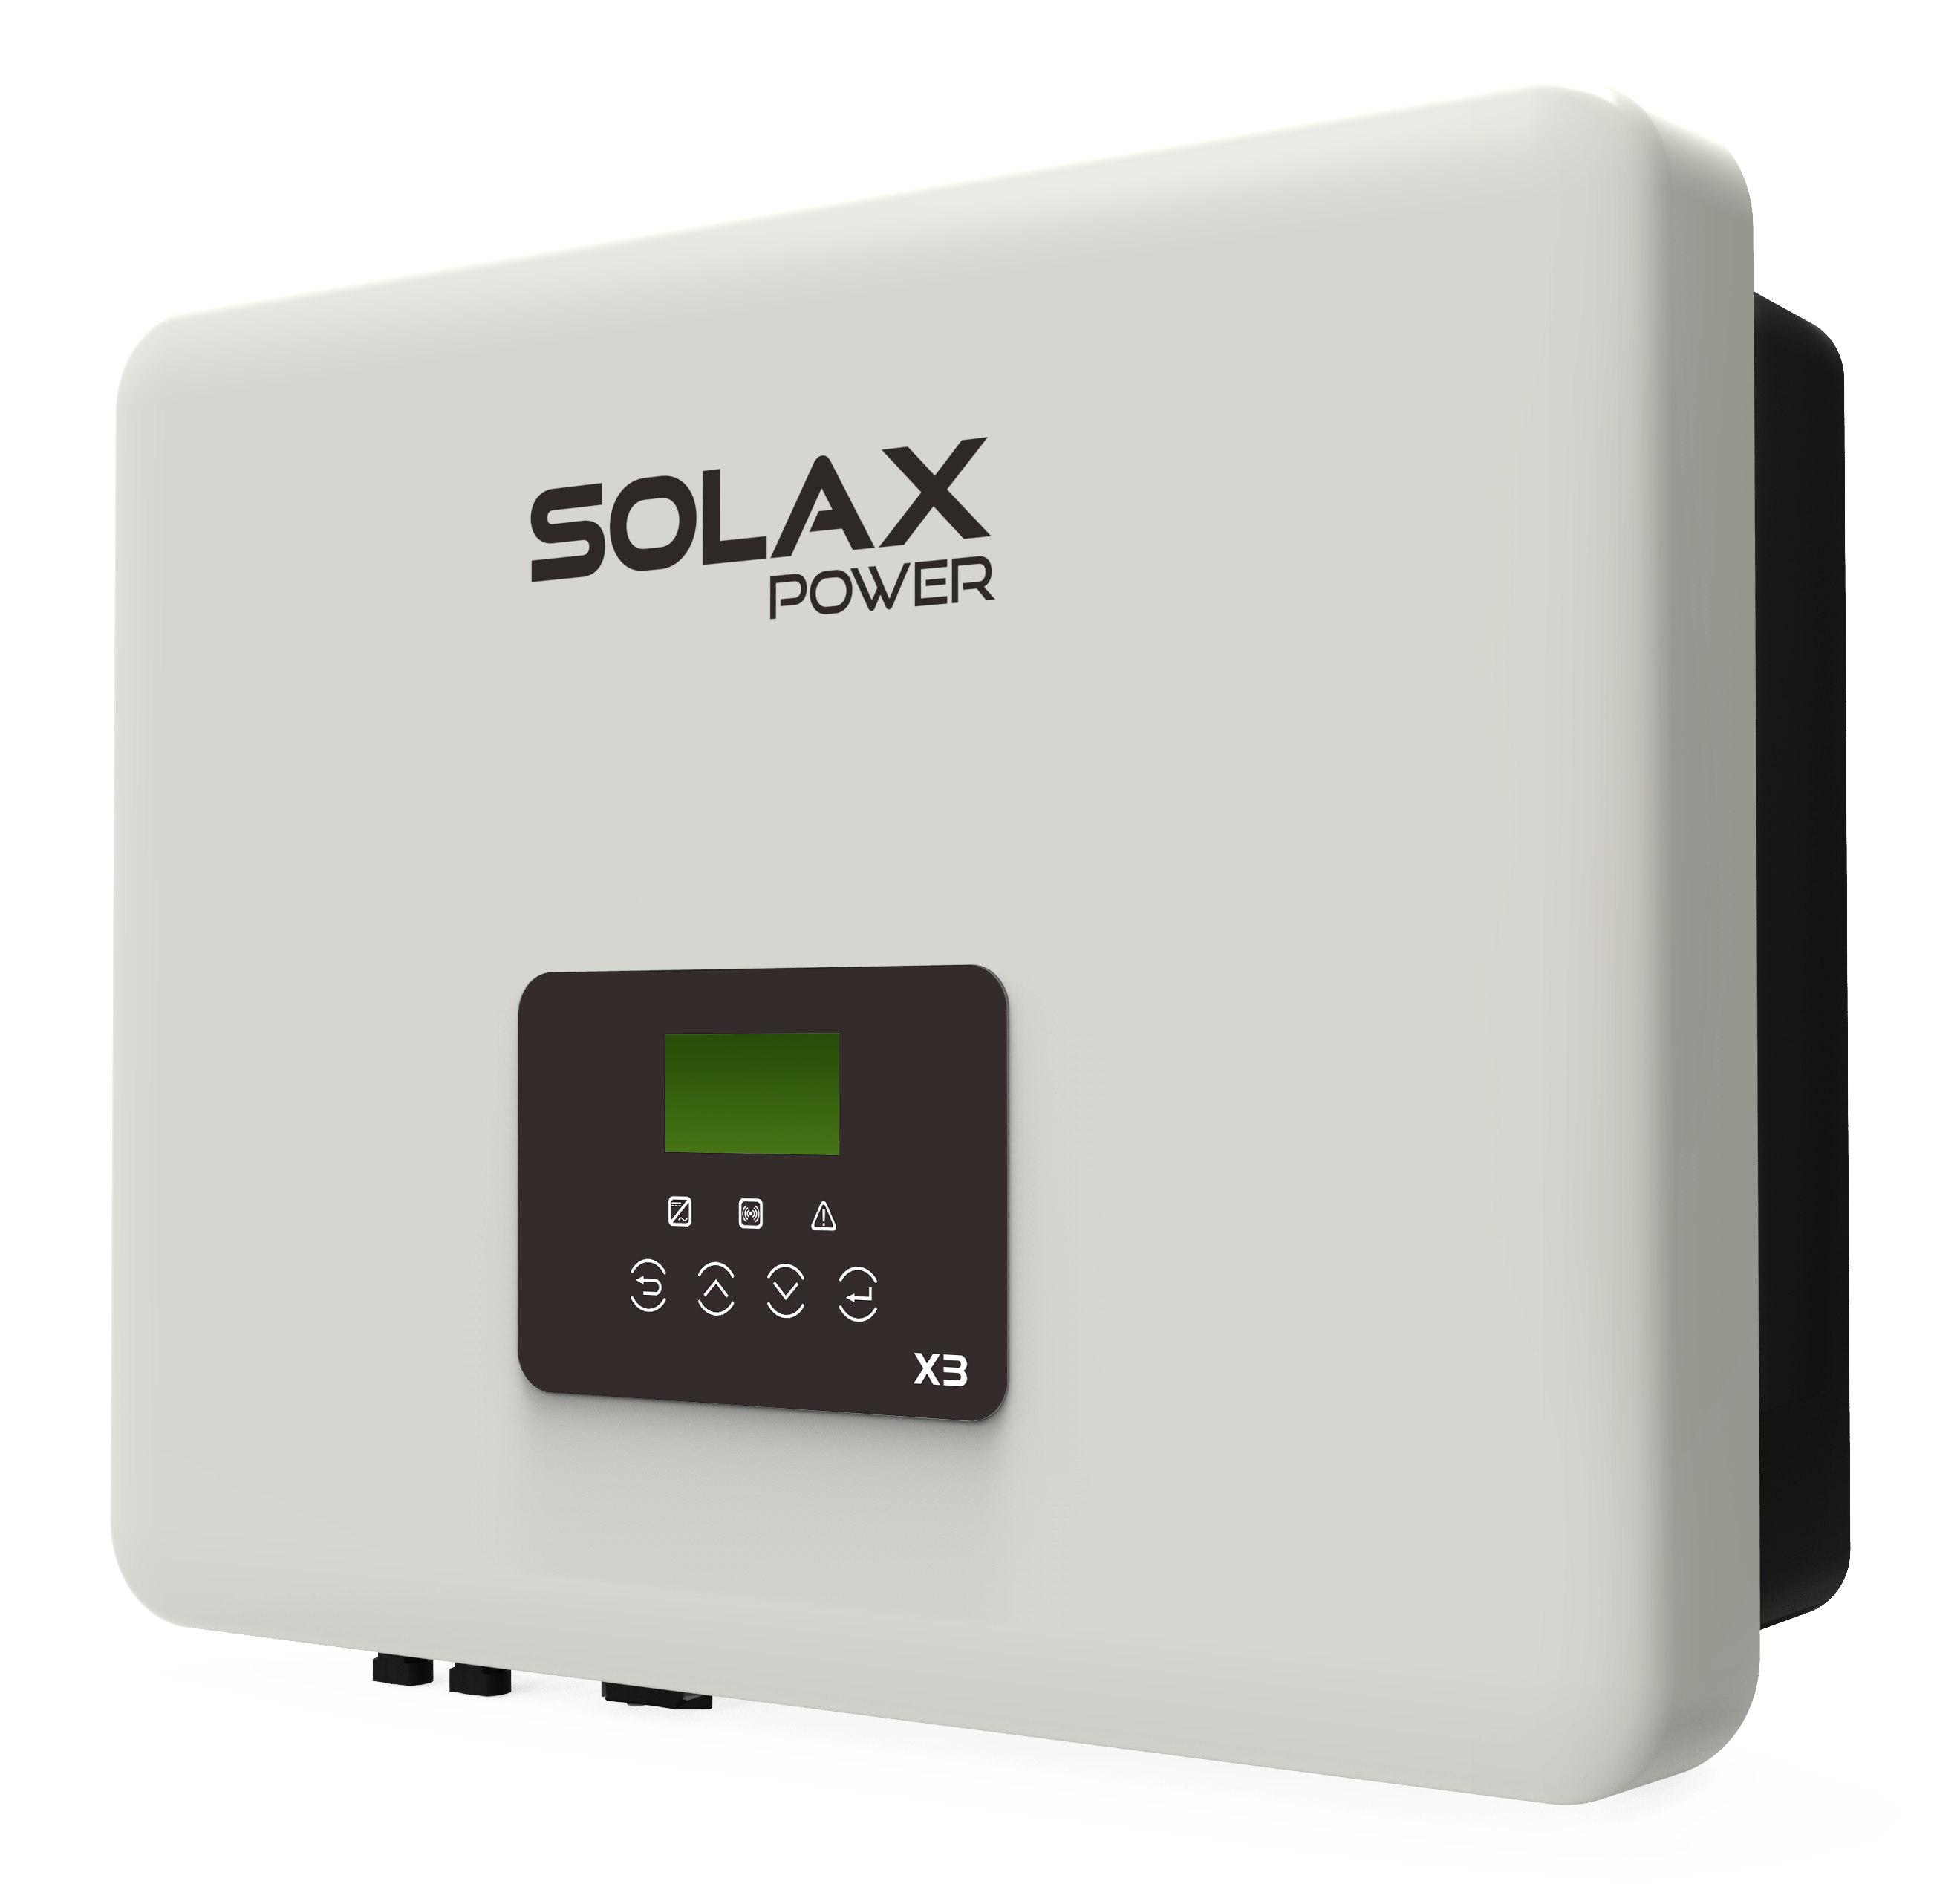 SOLAX_INVERTER_6.0KW_3PHMICX3-6.0-T-D